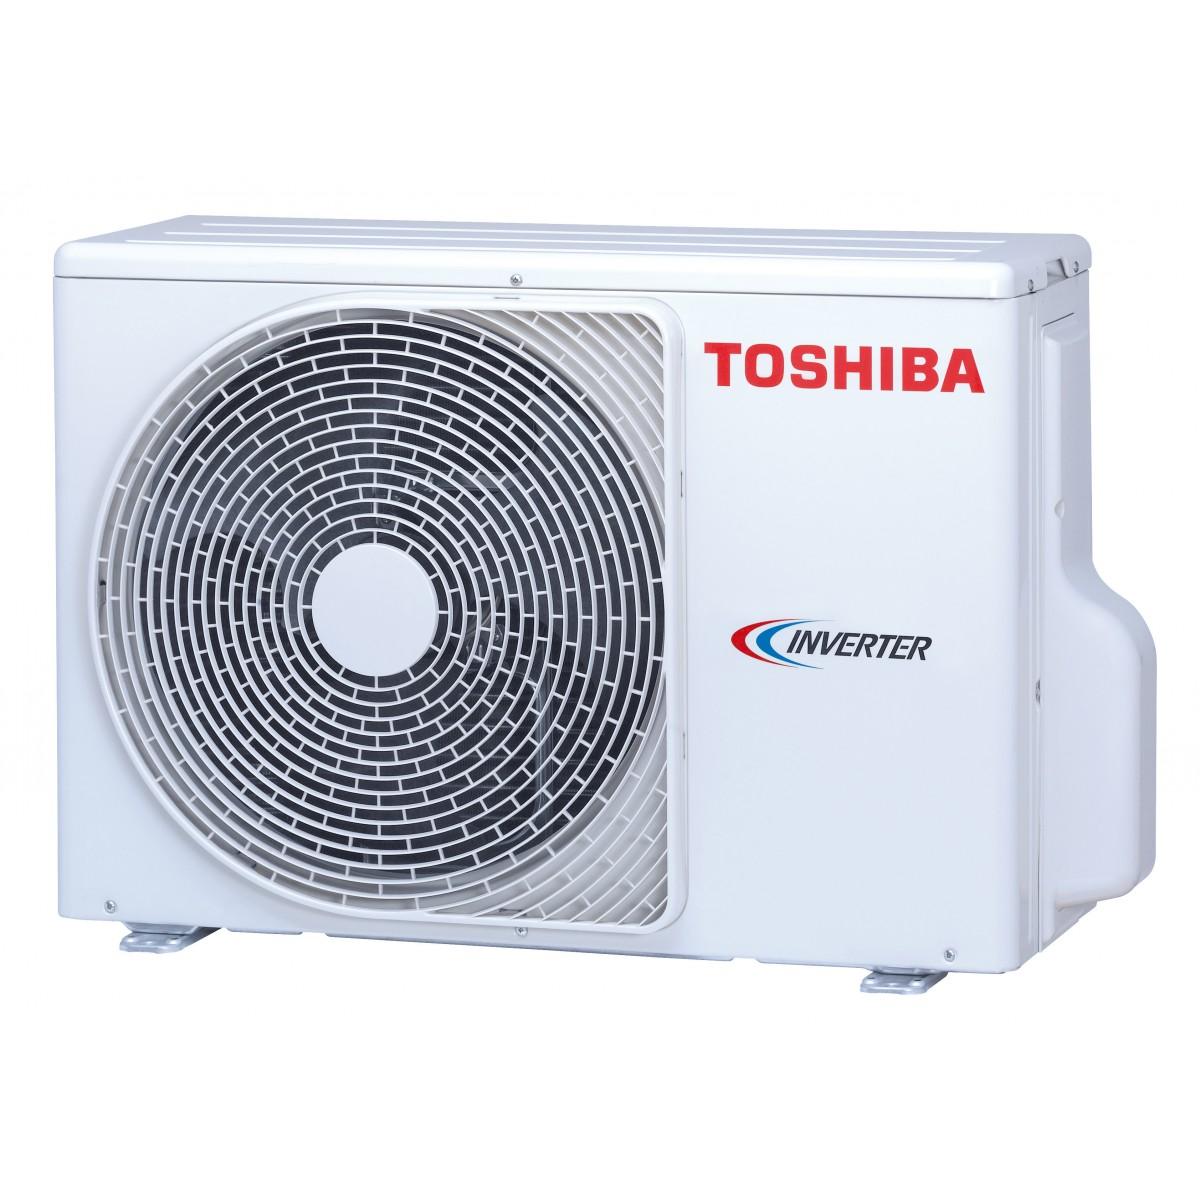 Toshiba RAS-2M14U2AVG-E venkovní multisplitová jednotka 4 kW